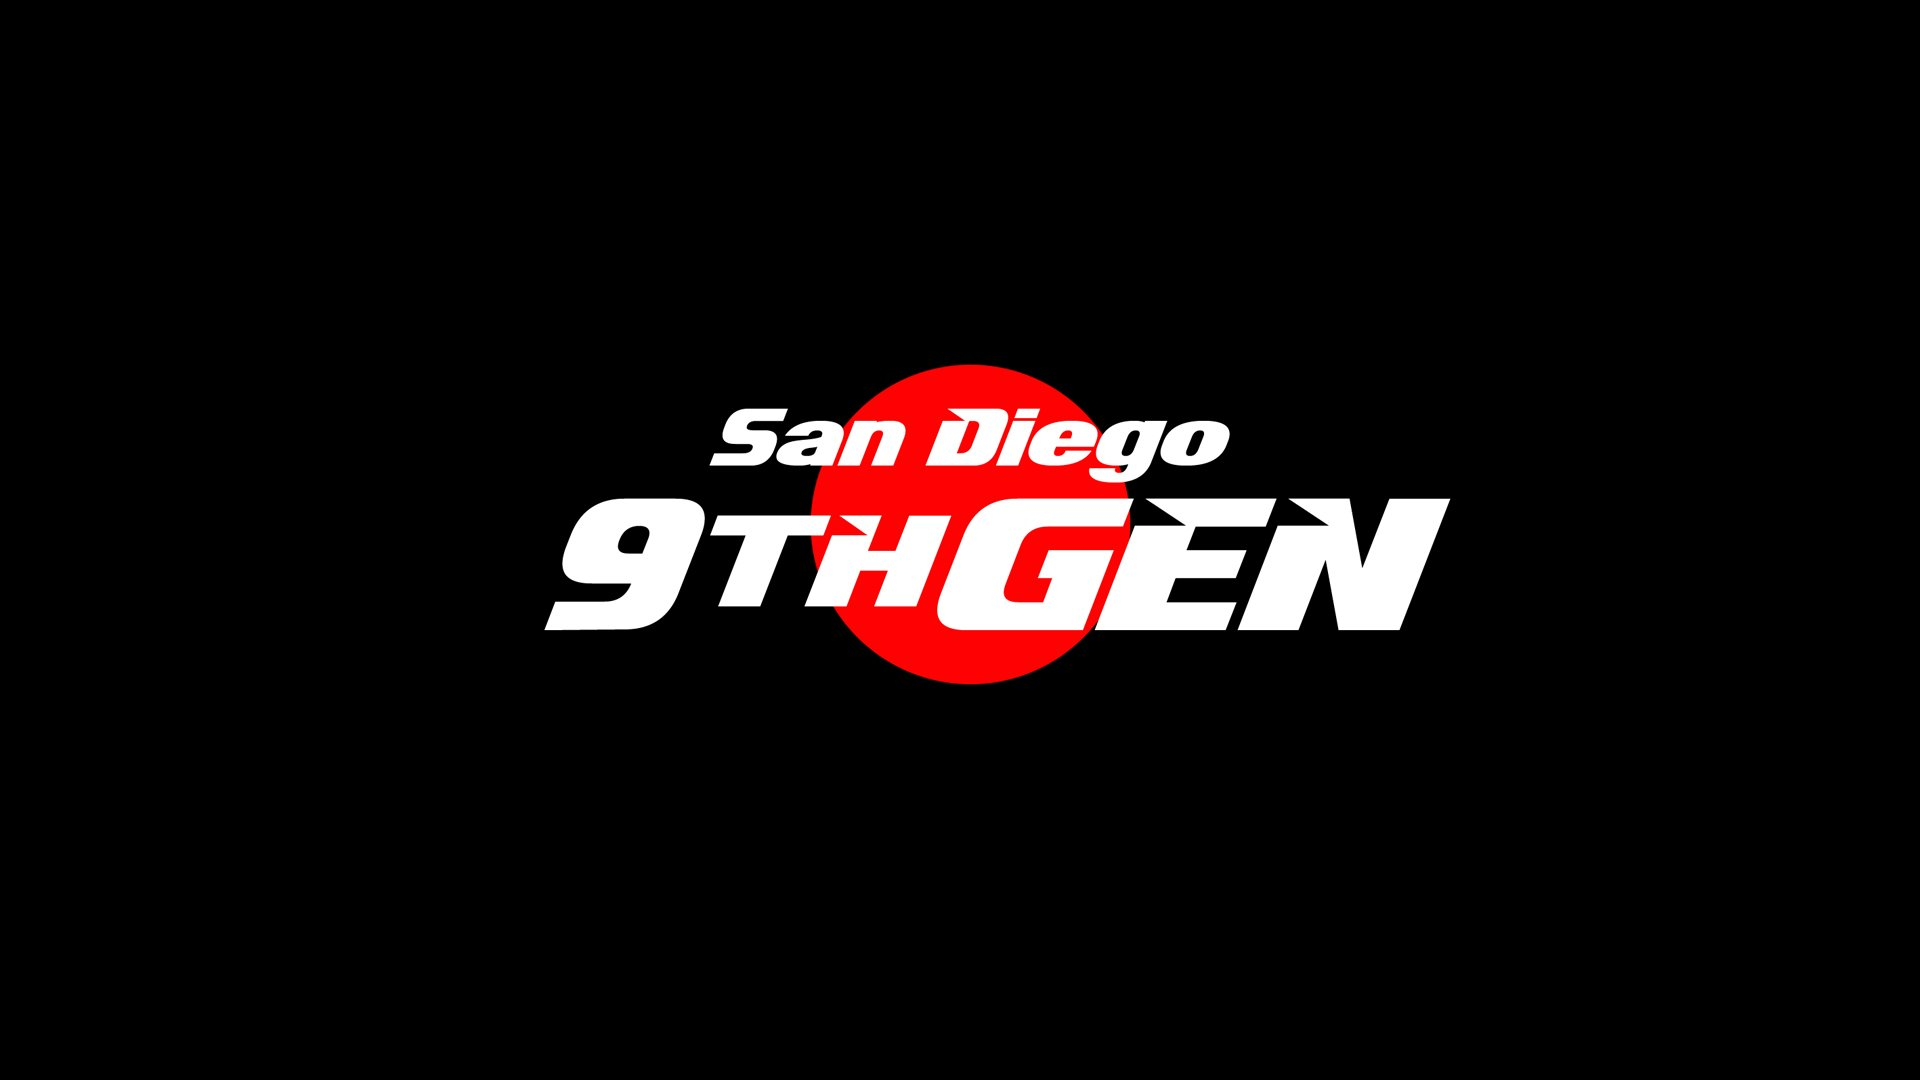 SAN DIEGO 9thGen Official page-san-diego-9th-gen.jpg